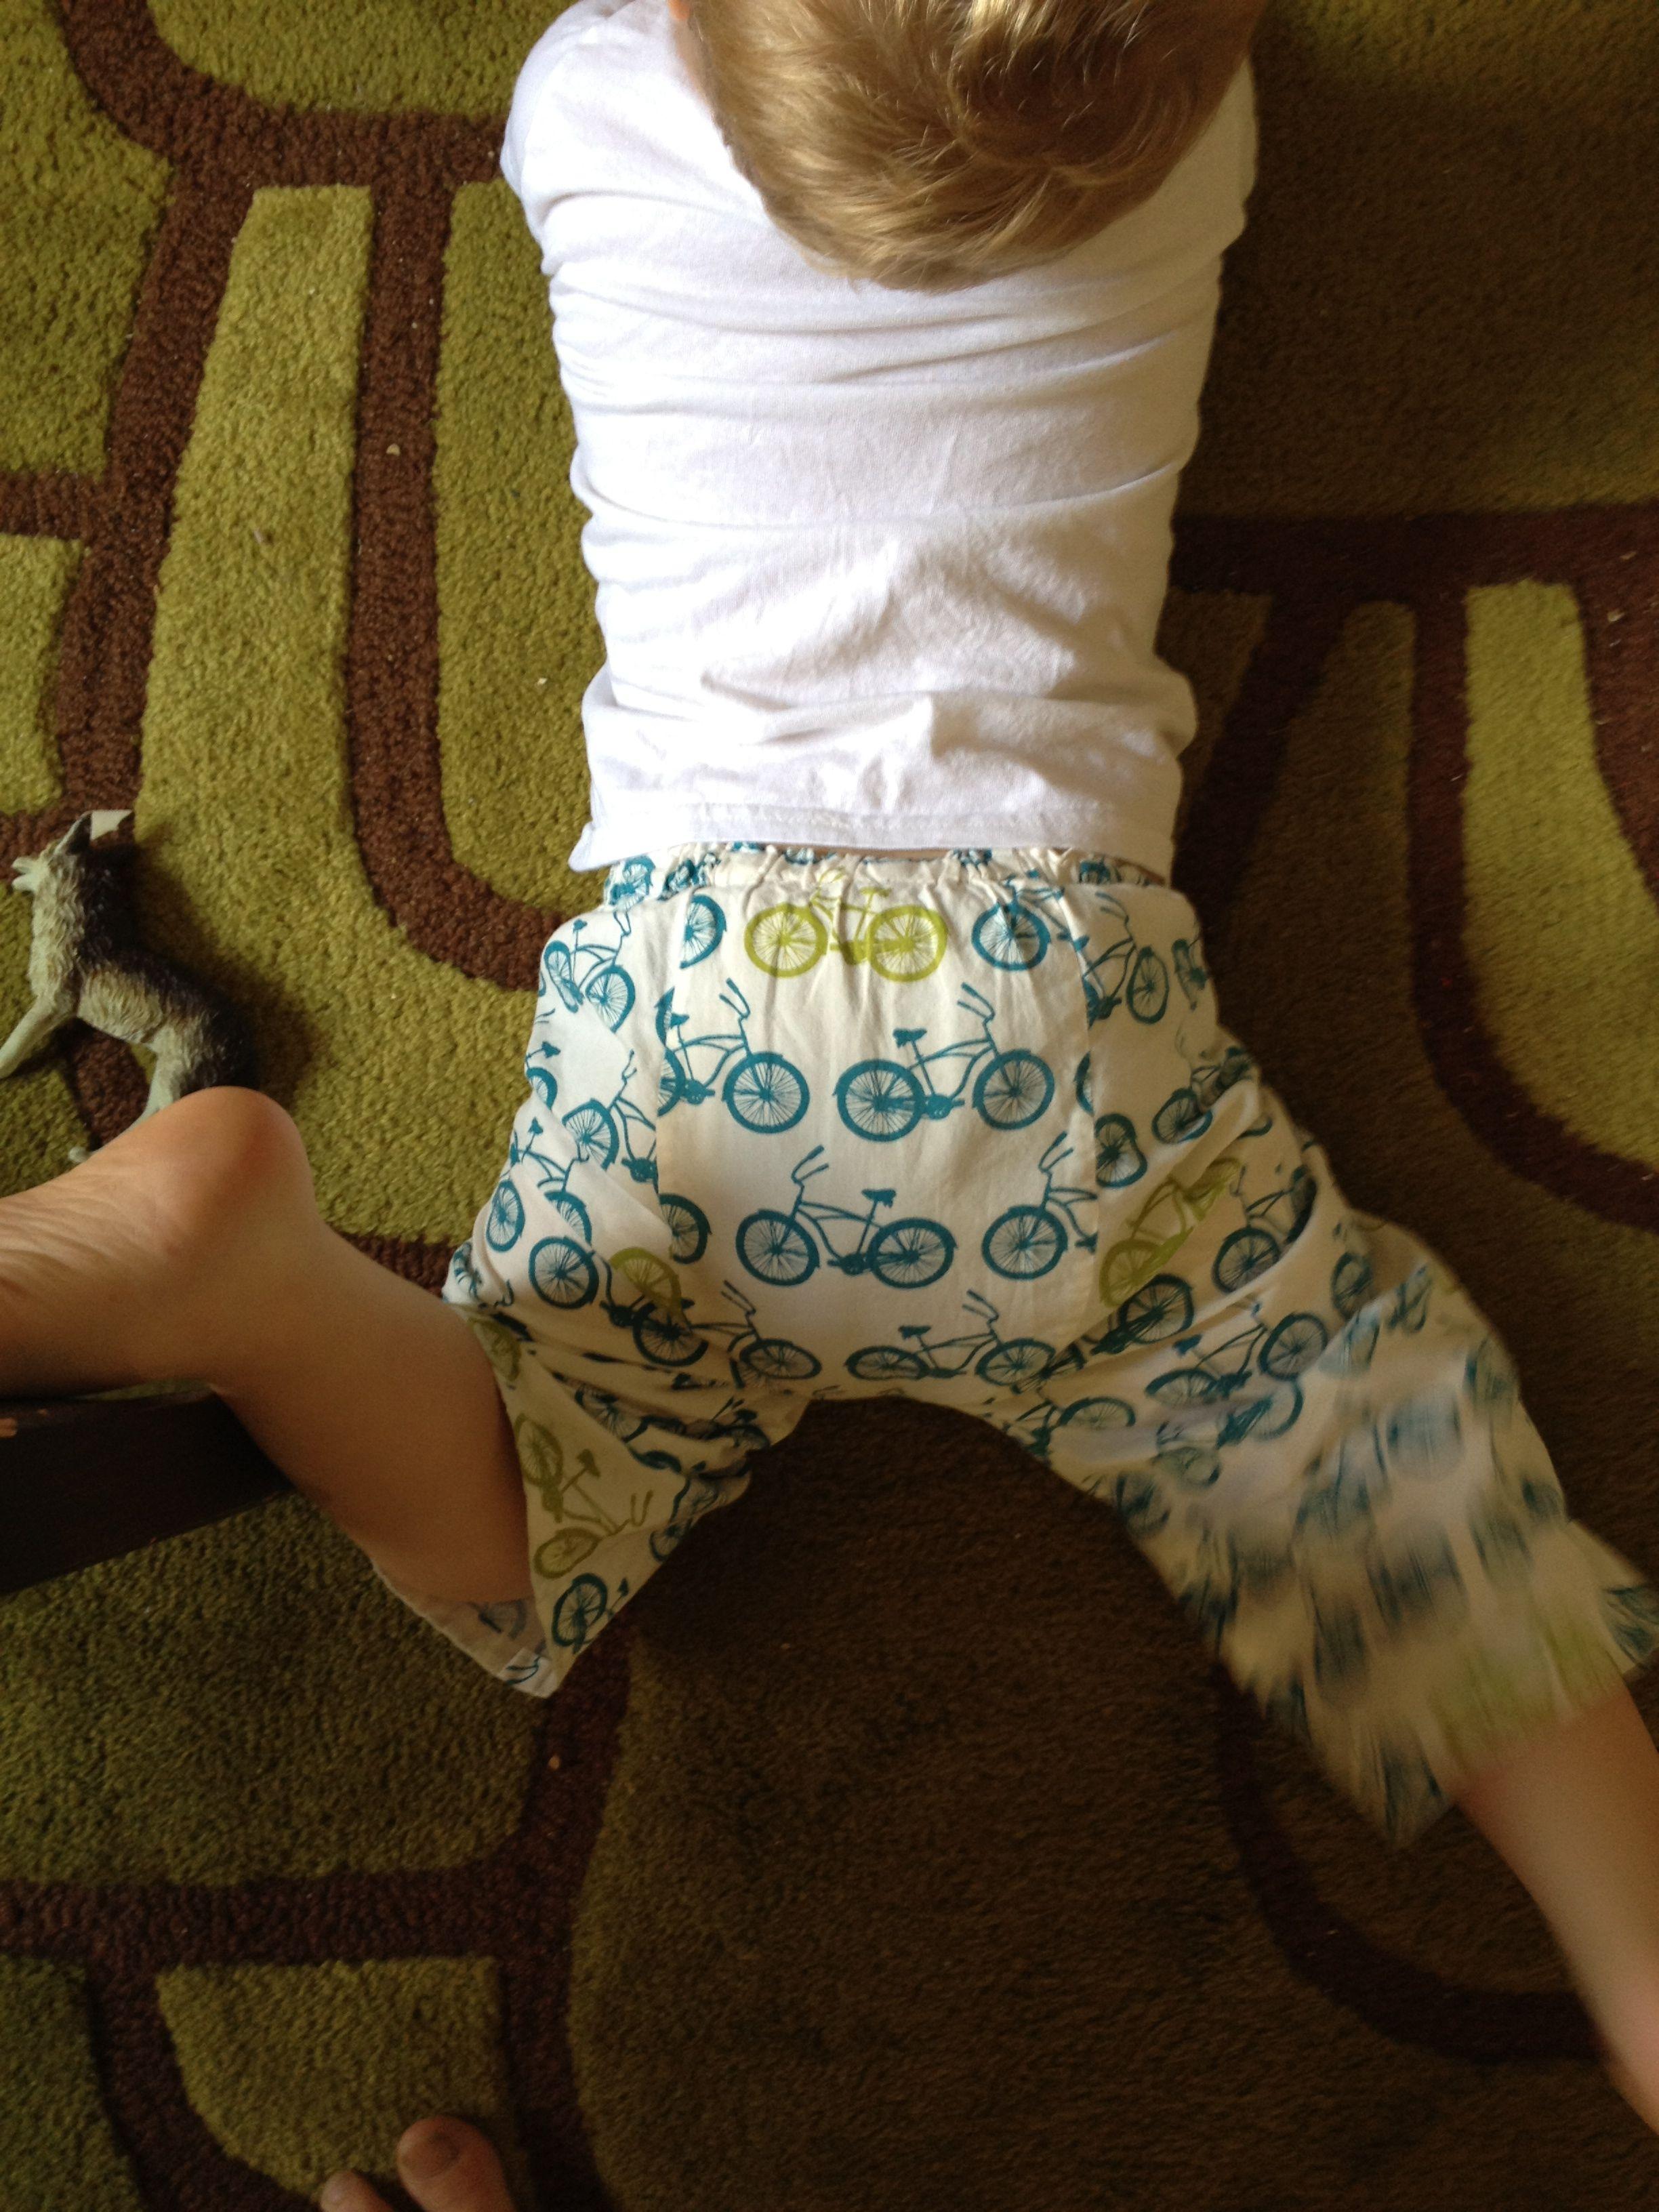 diapered Spank bottom three year olds